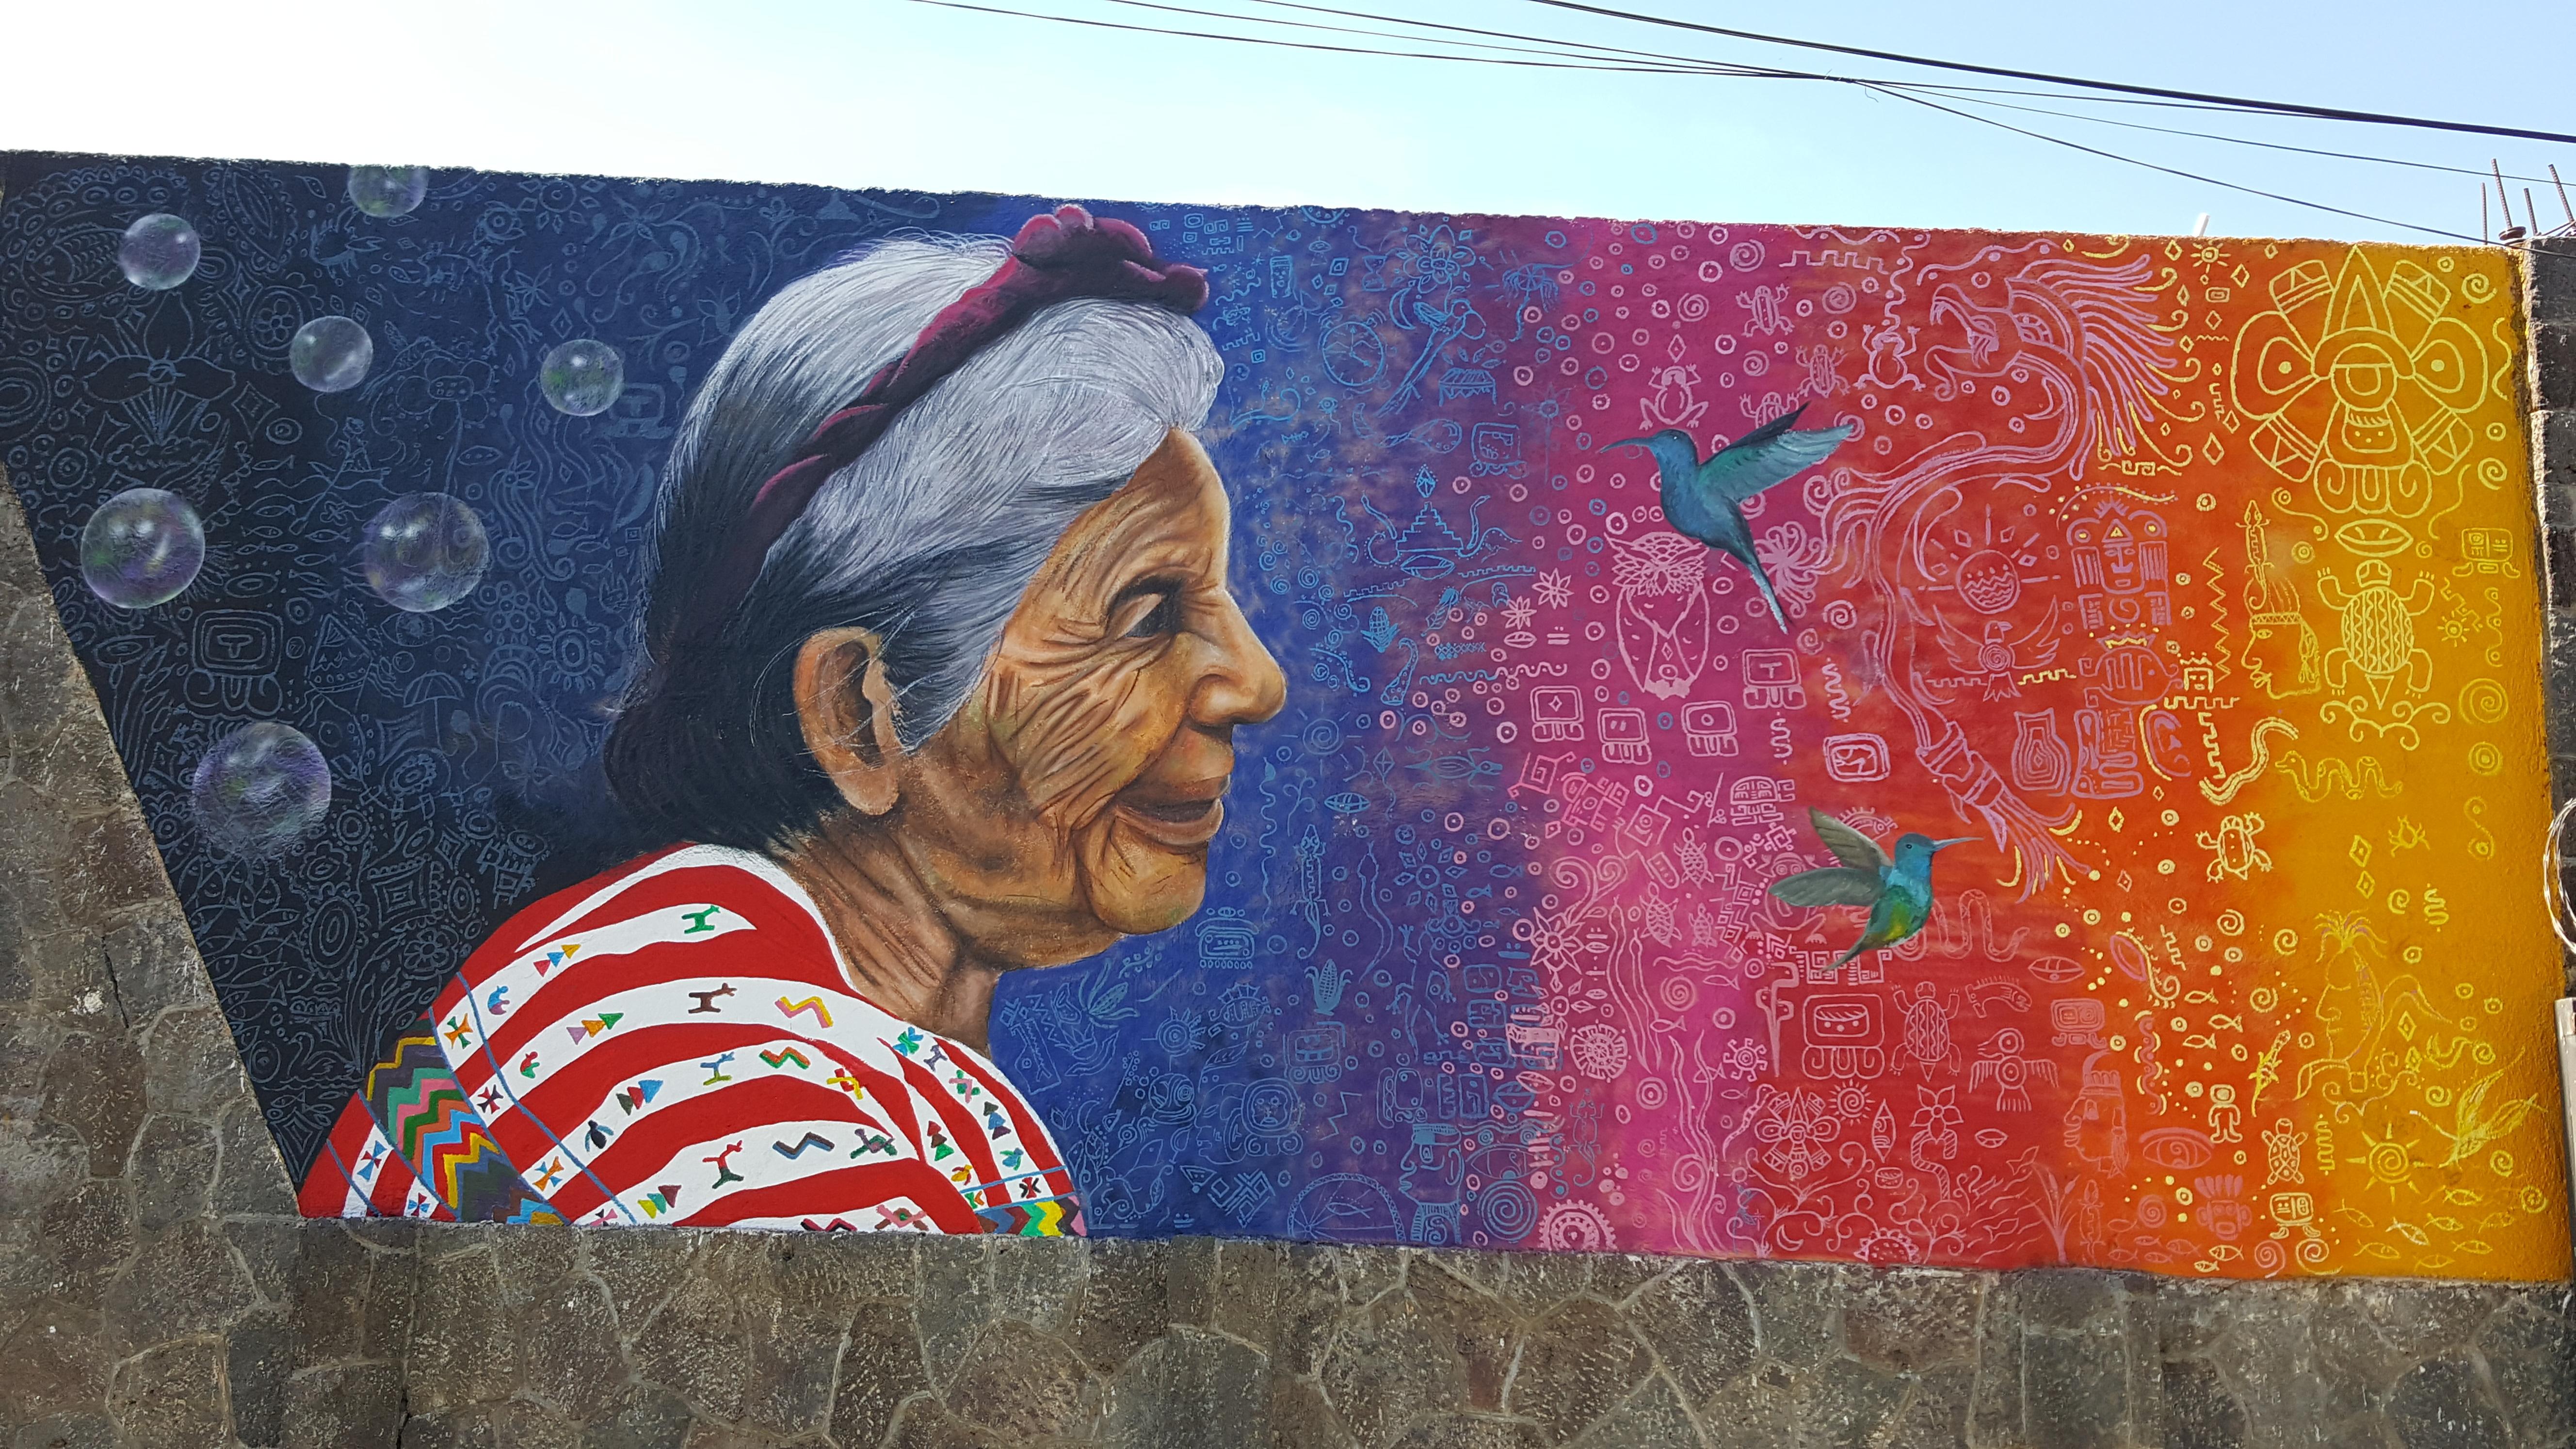 Mural in San Lucas Tolimán, Guatemala, Hotel Tolimán, ca. 7 x 3m, 2018